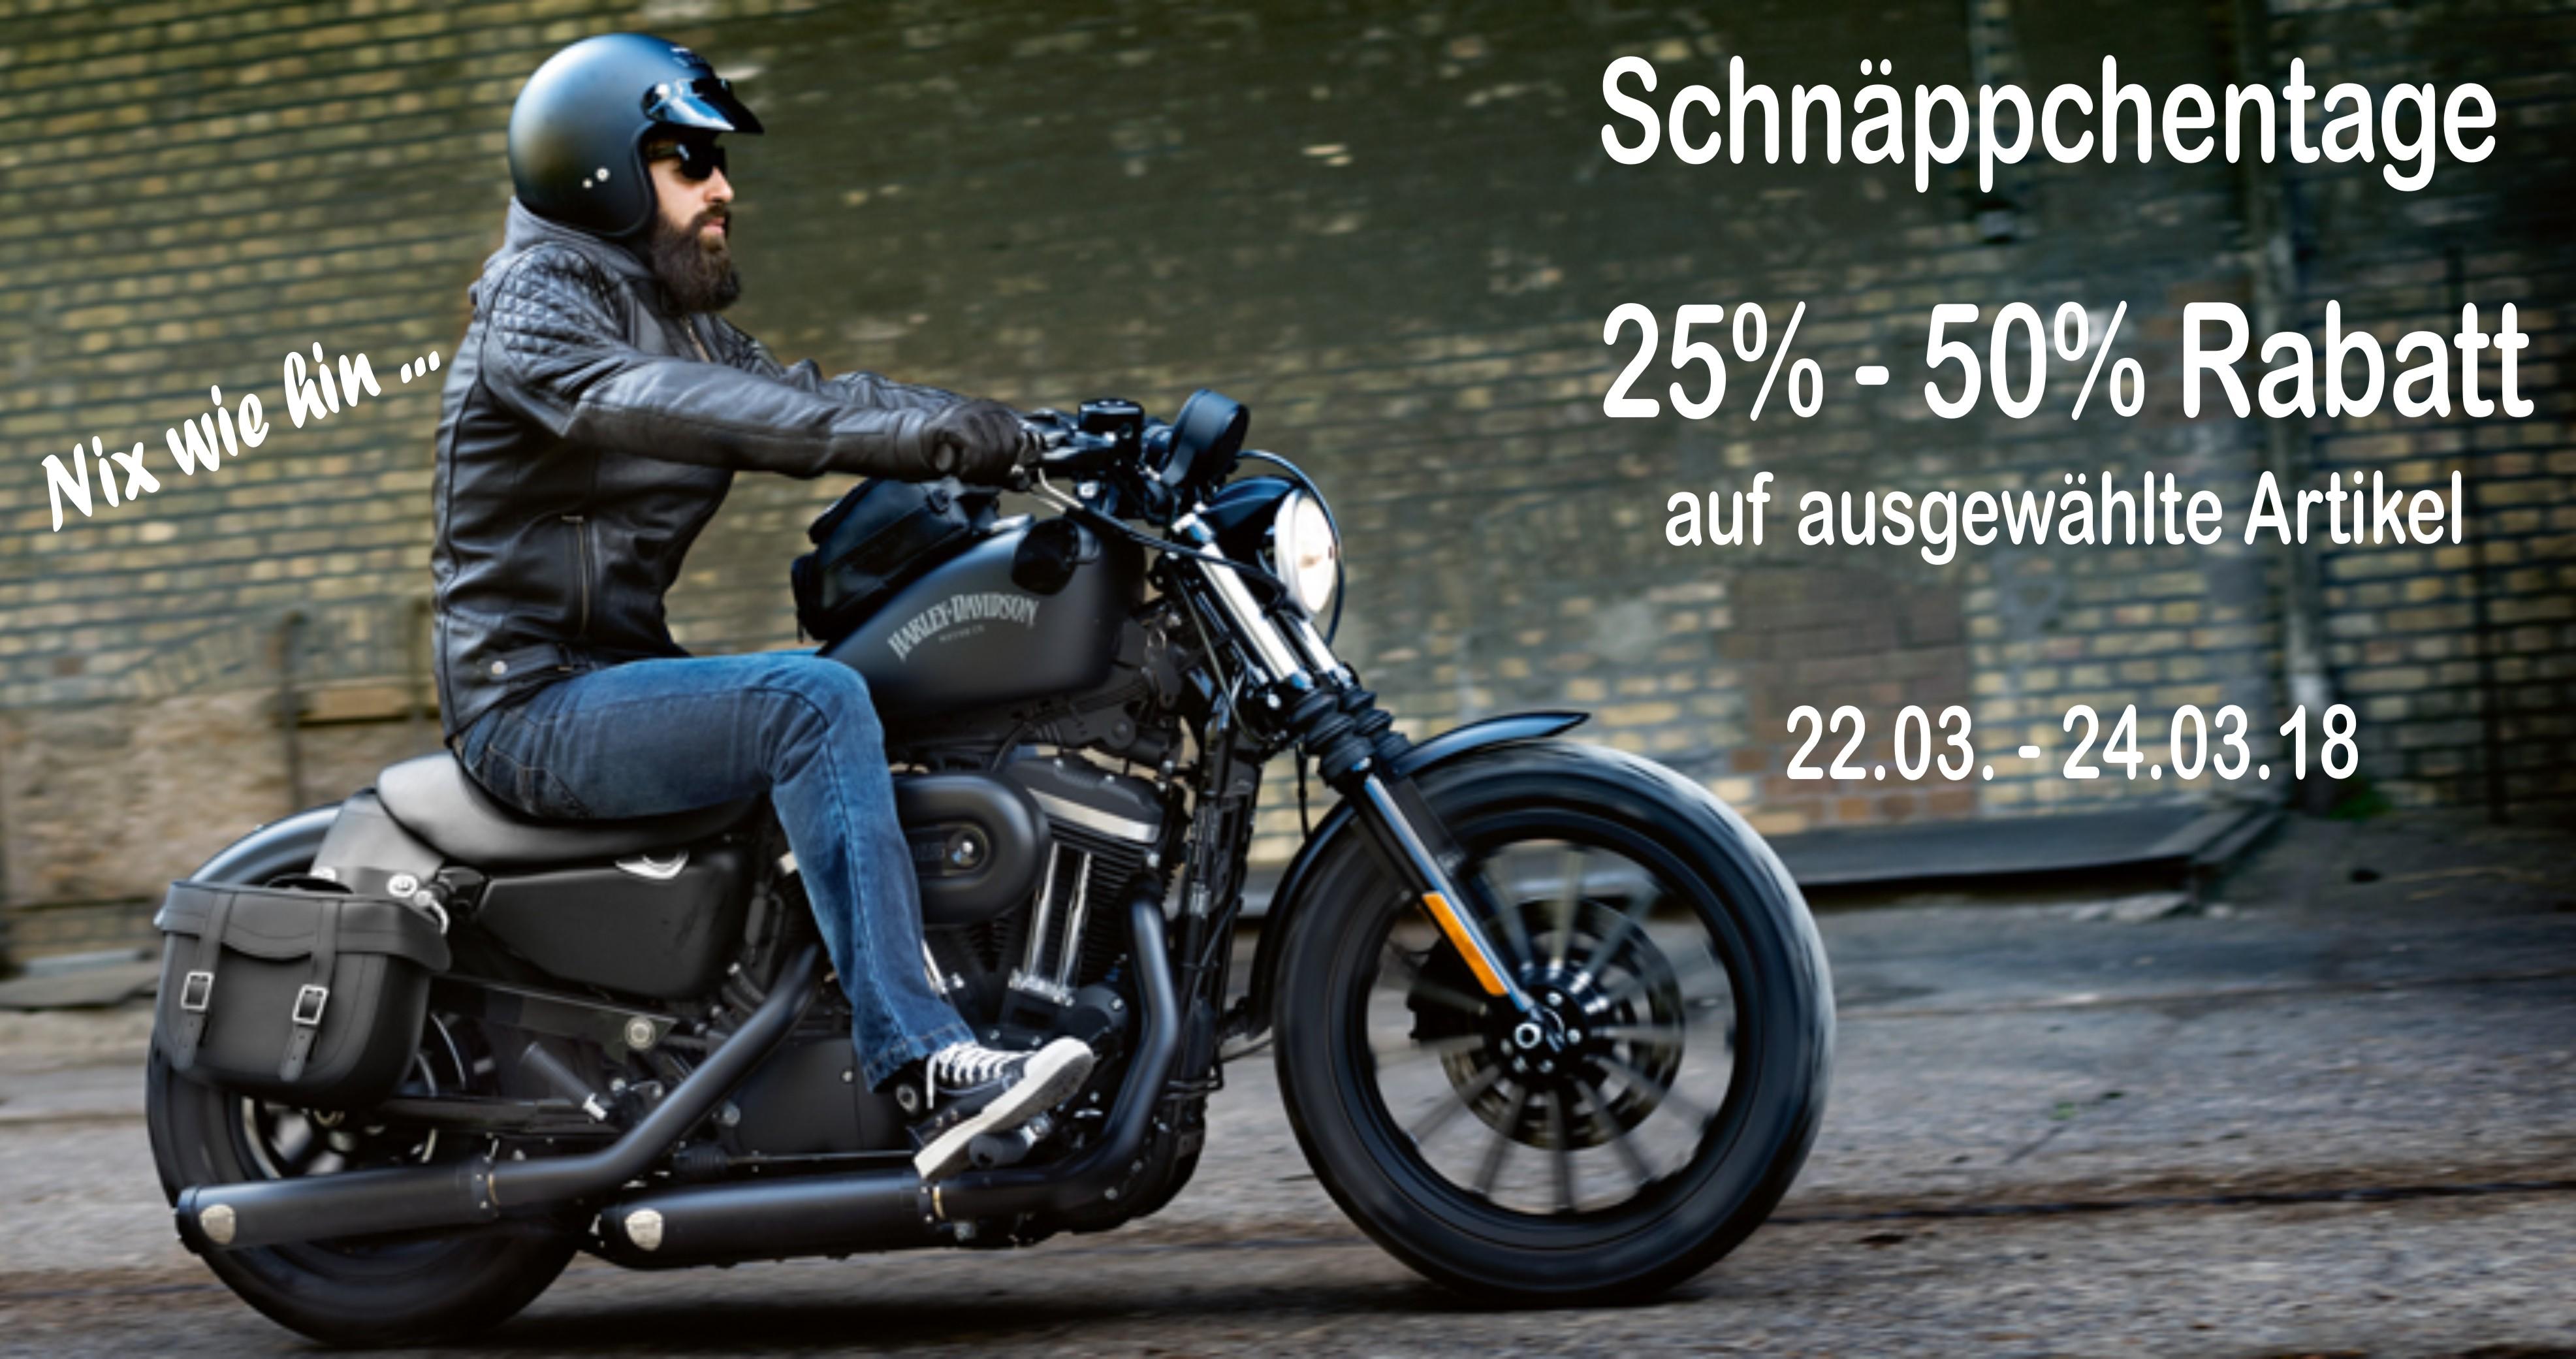 Startseite « SOS Motorradbekleidung